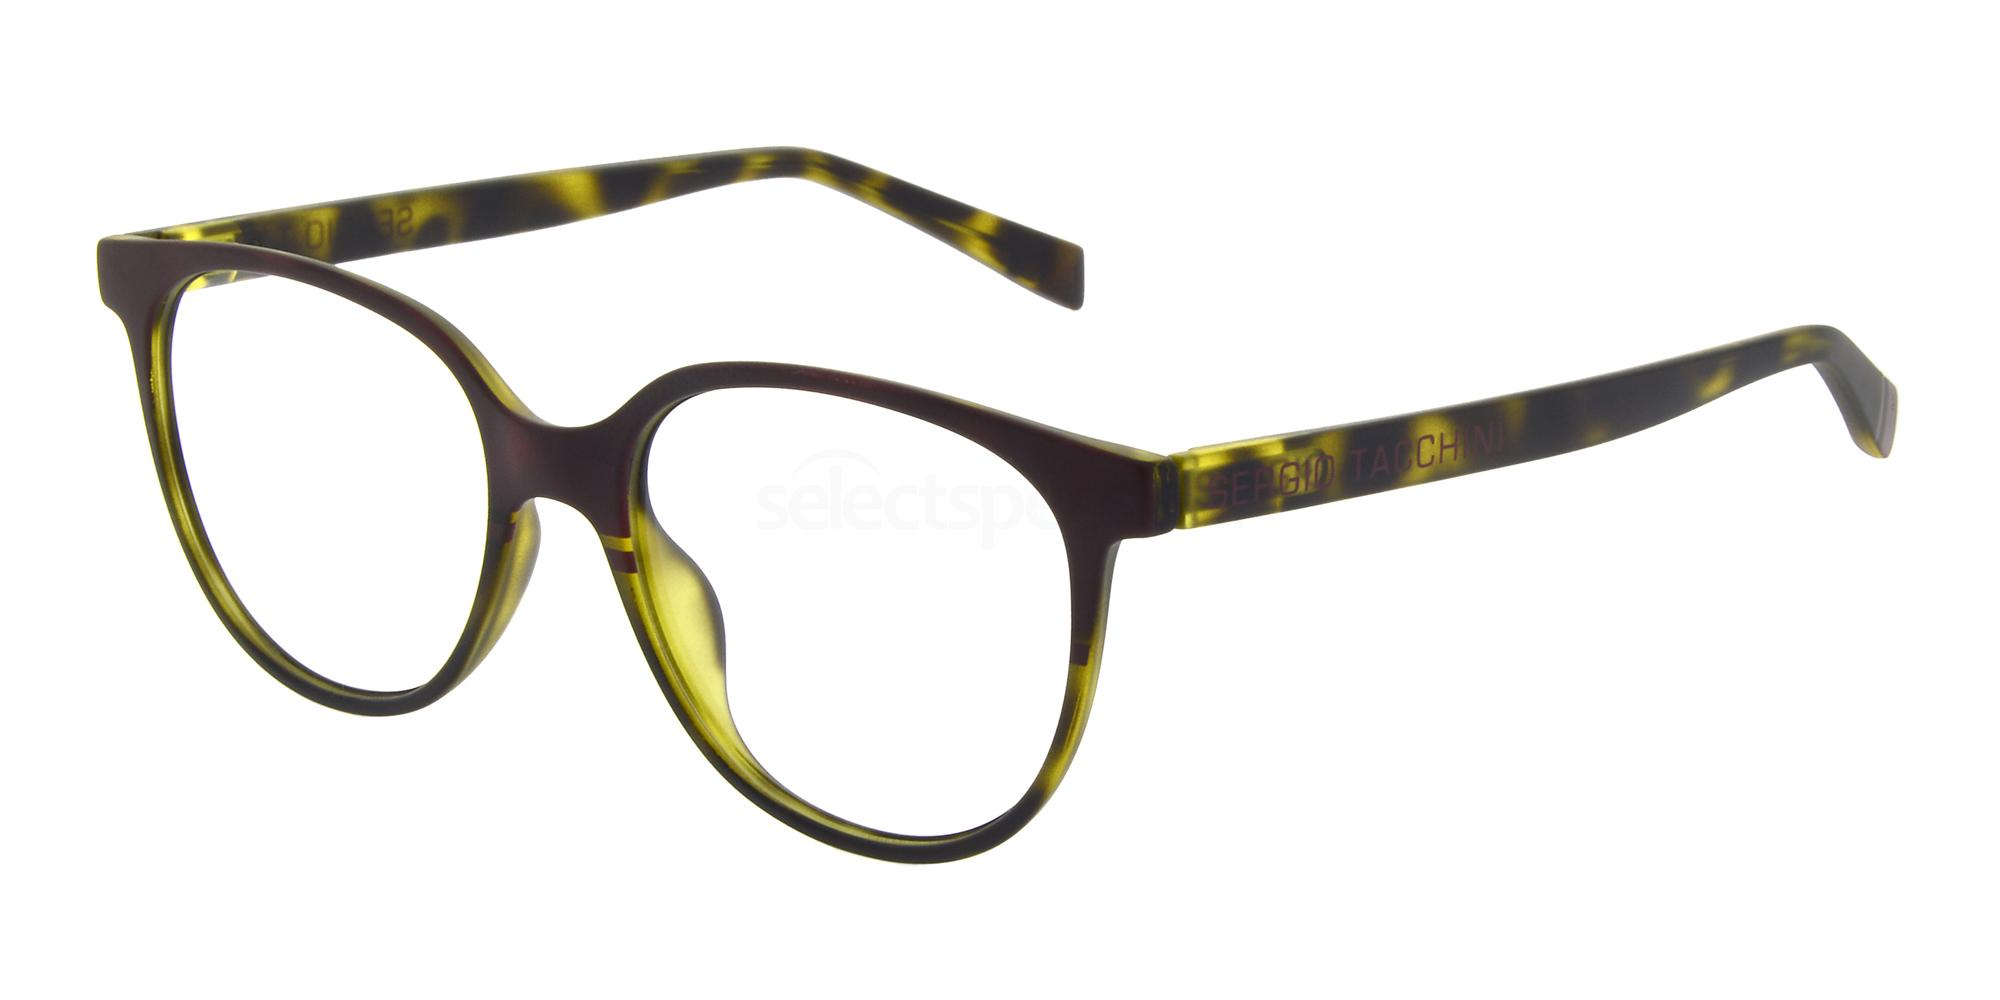 402 ST1006 Glasses, Sergio Tacchini